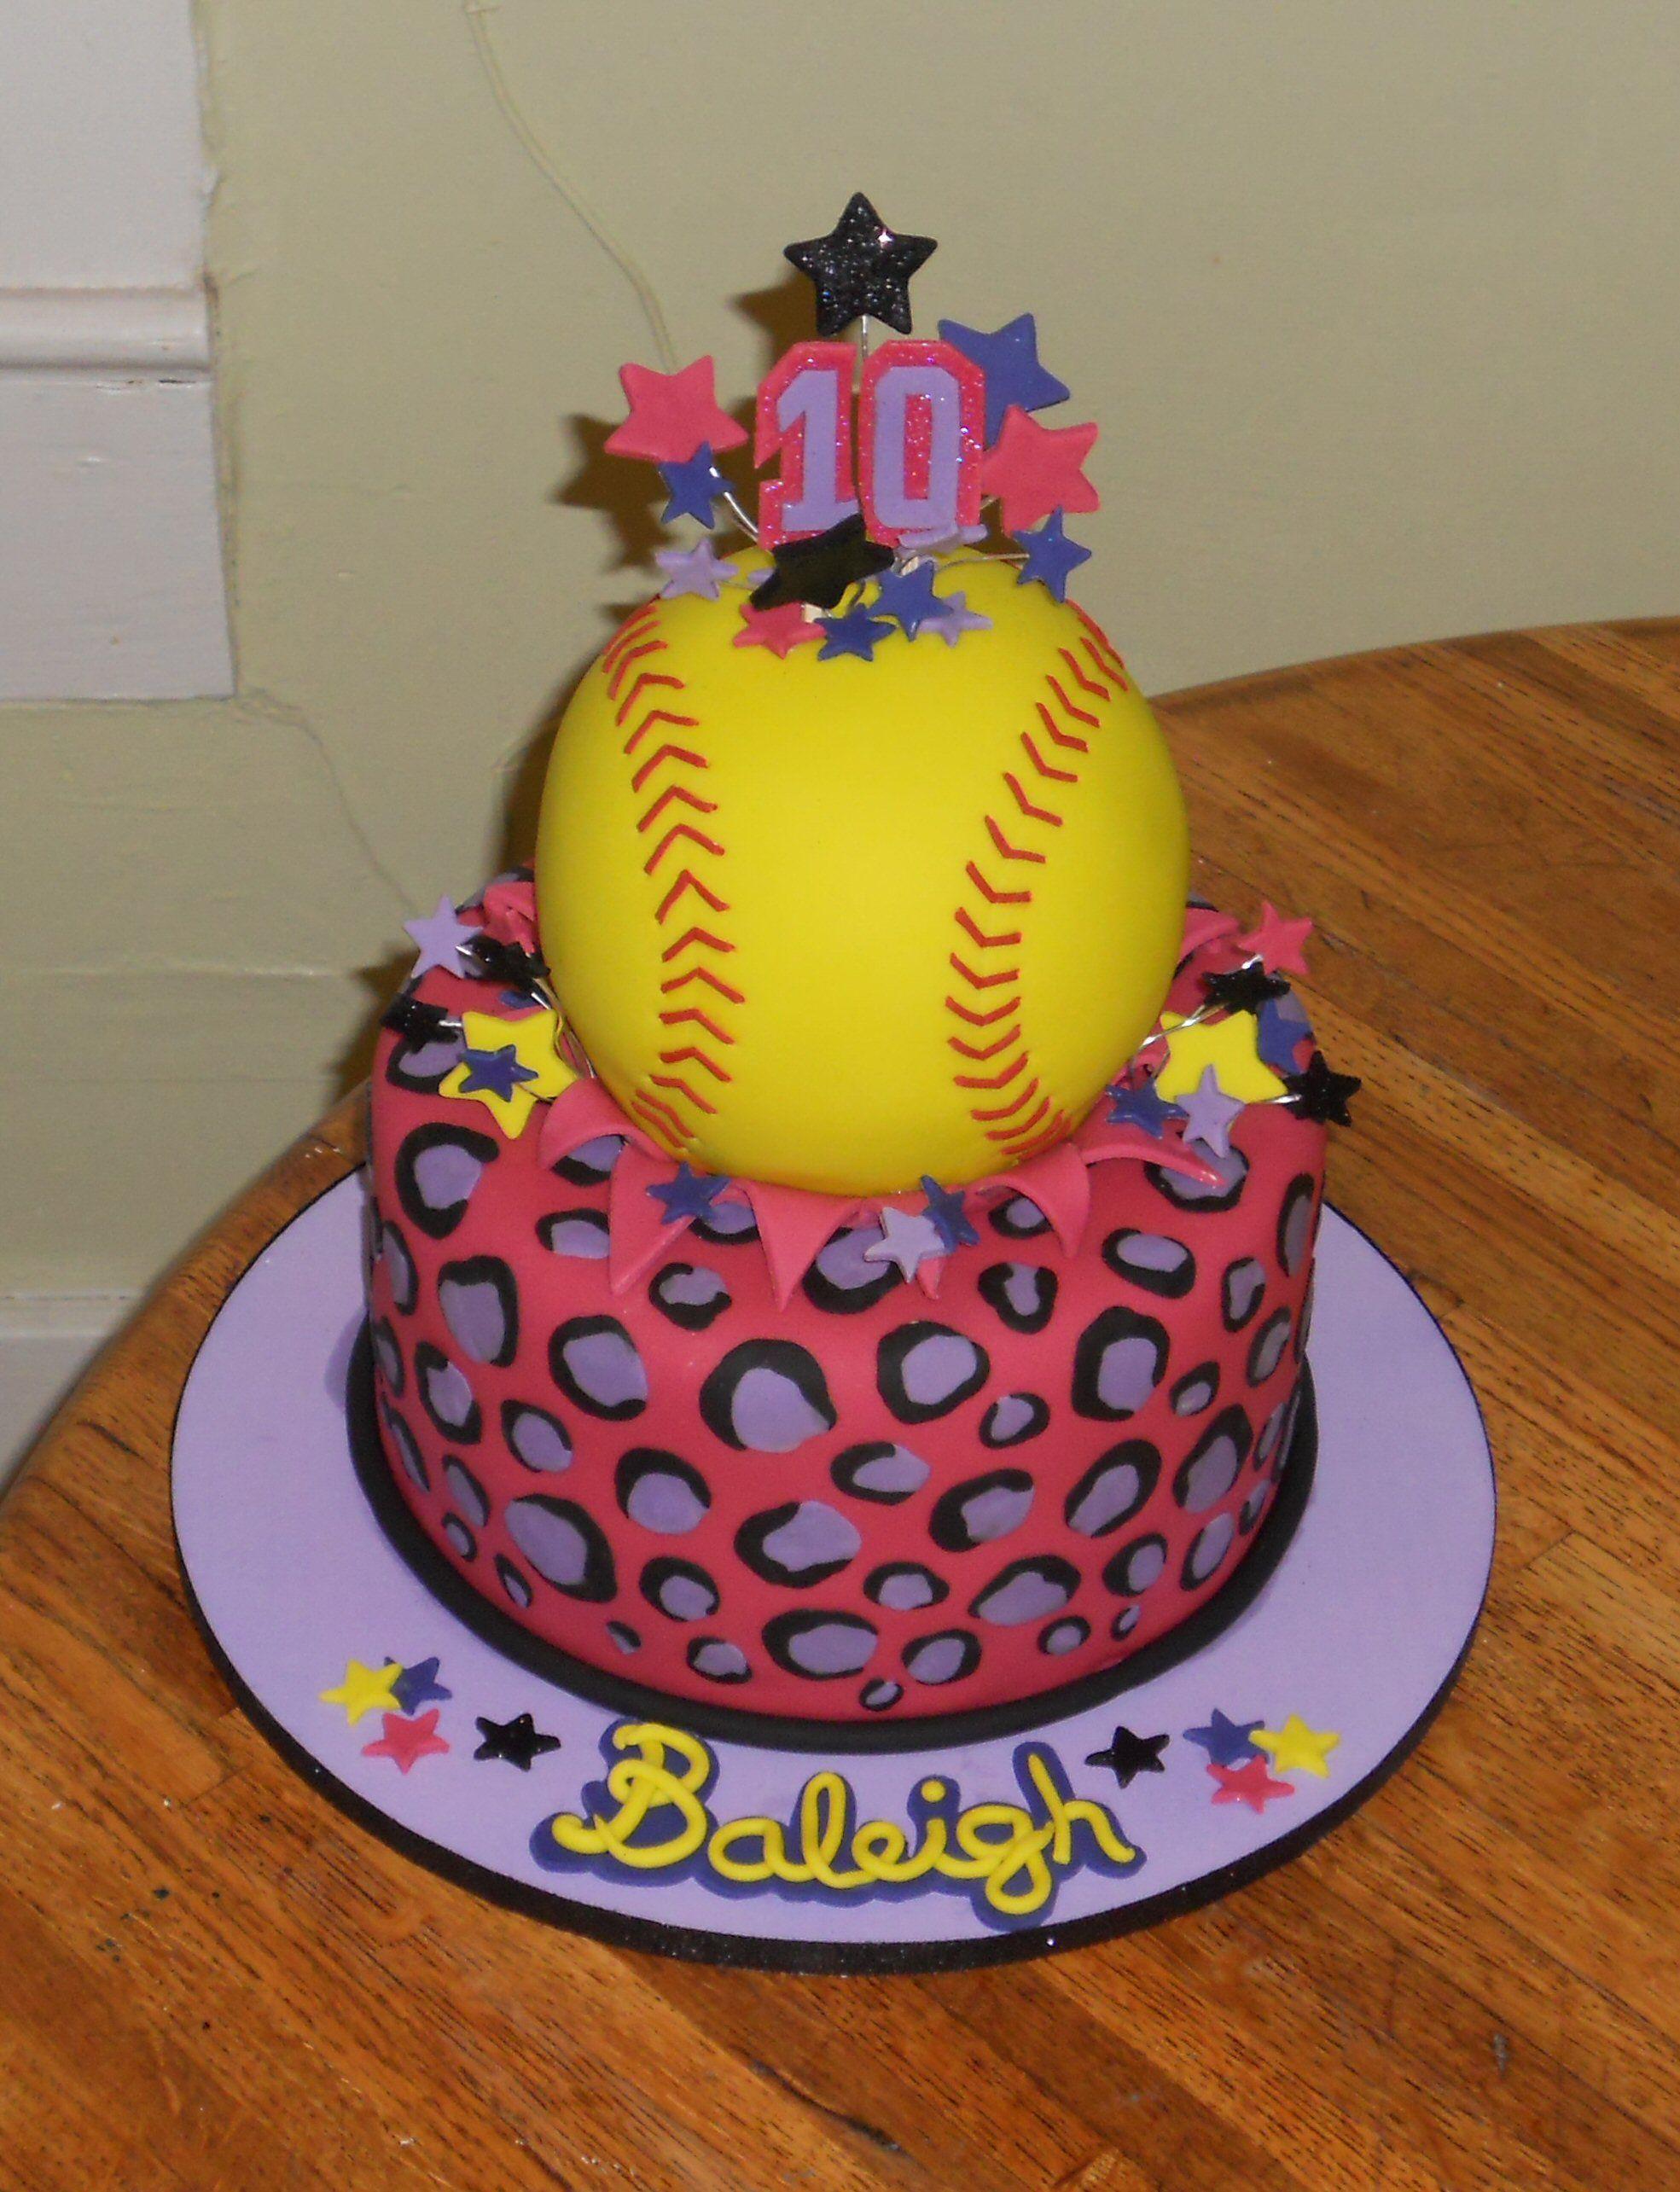 Wondrous Softball Birthday Cake But With Zebra Stripes Softball Birthday Personalised Birthday Cards Paralily Jamesorg